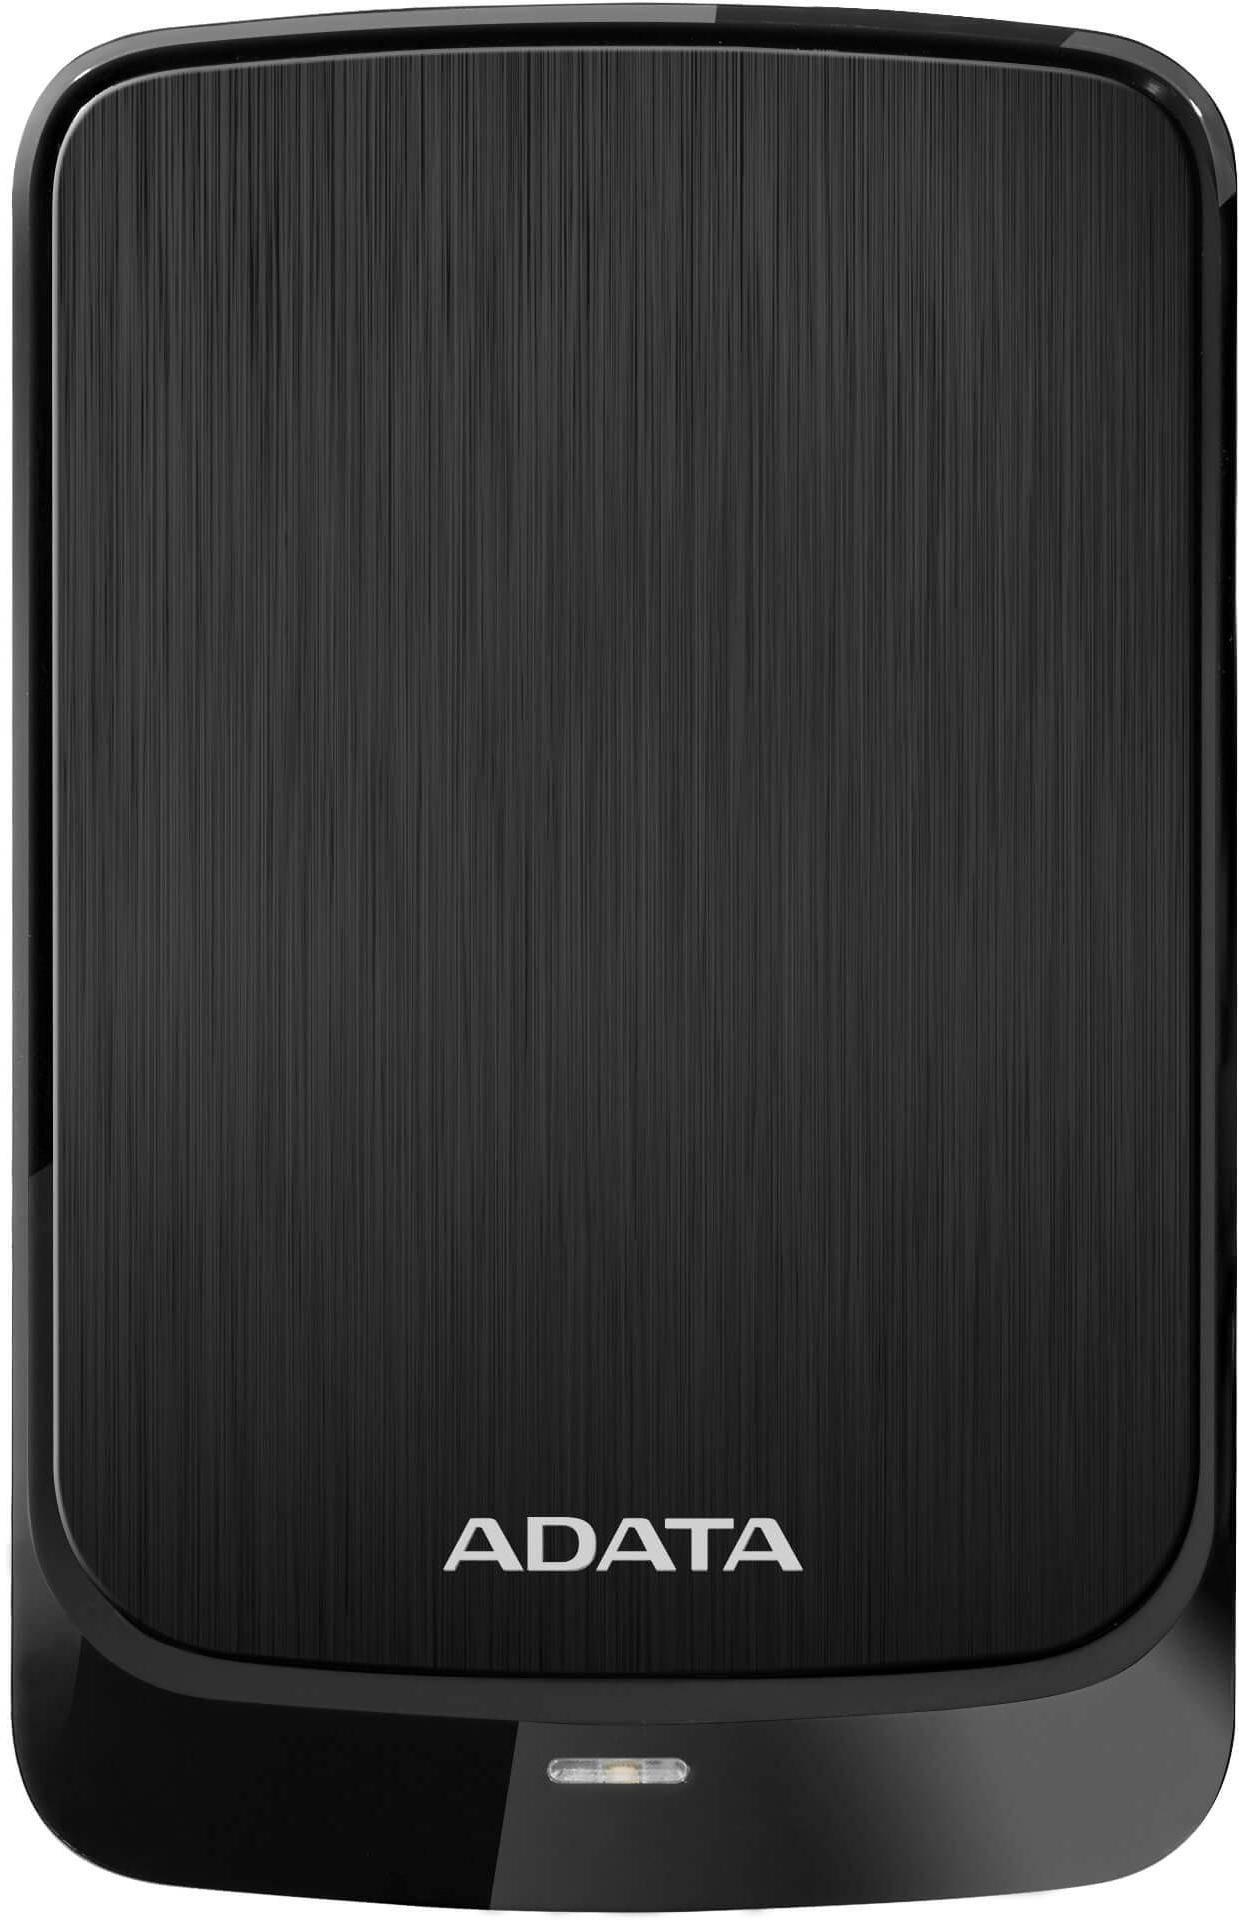 ADATA HV320 2TB Slim Compact Portable External Hard Drive zoom image